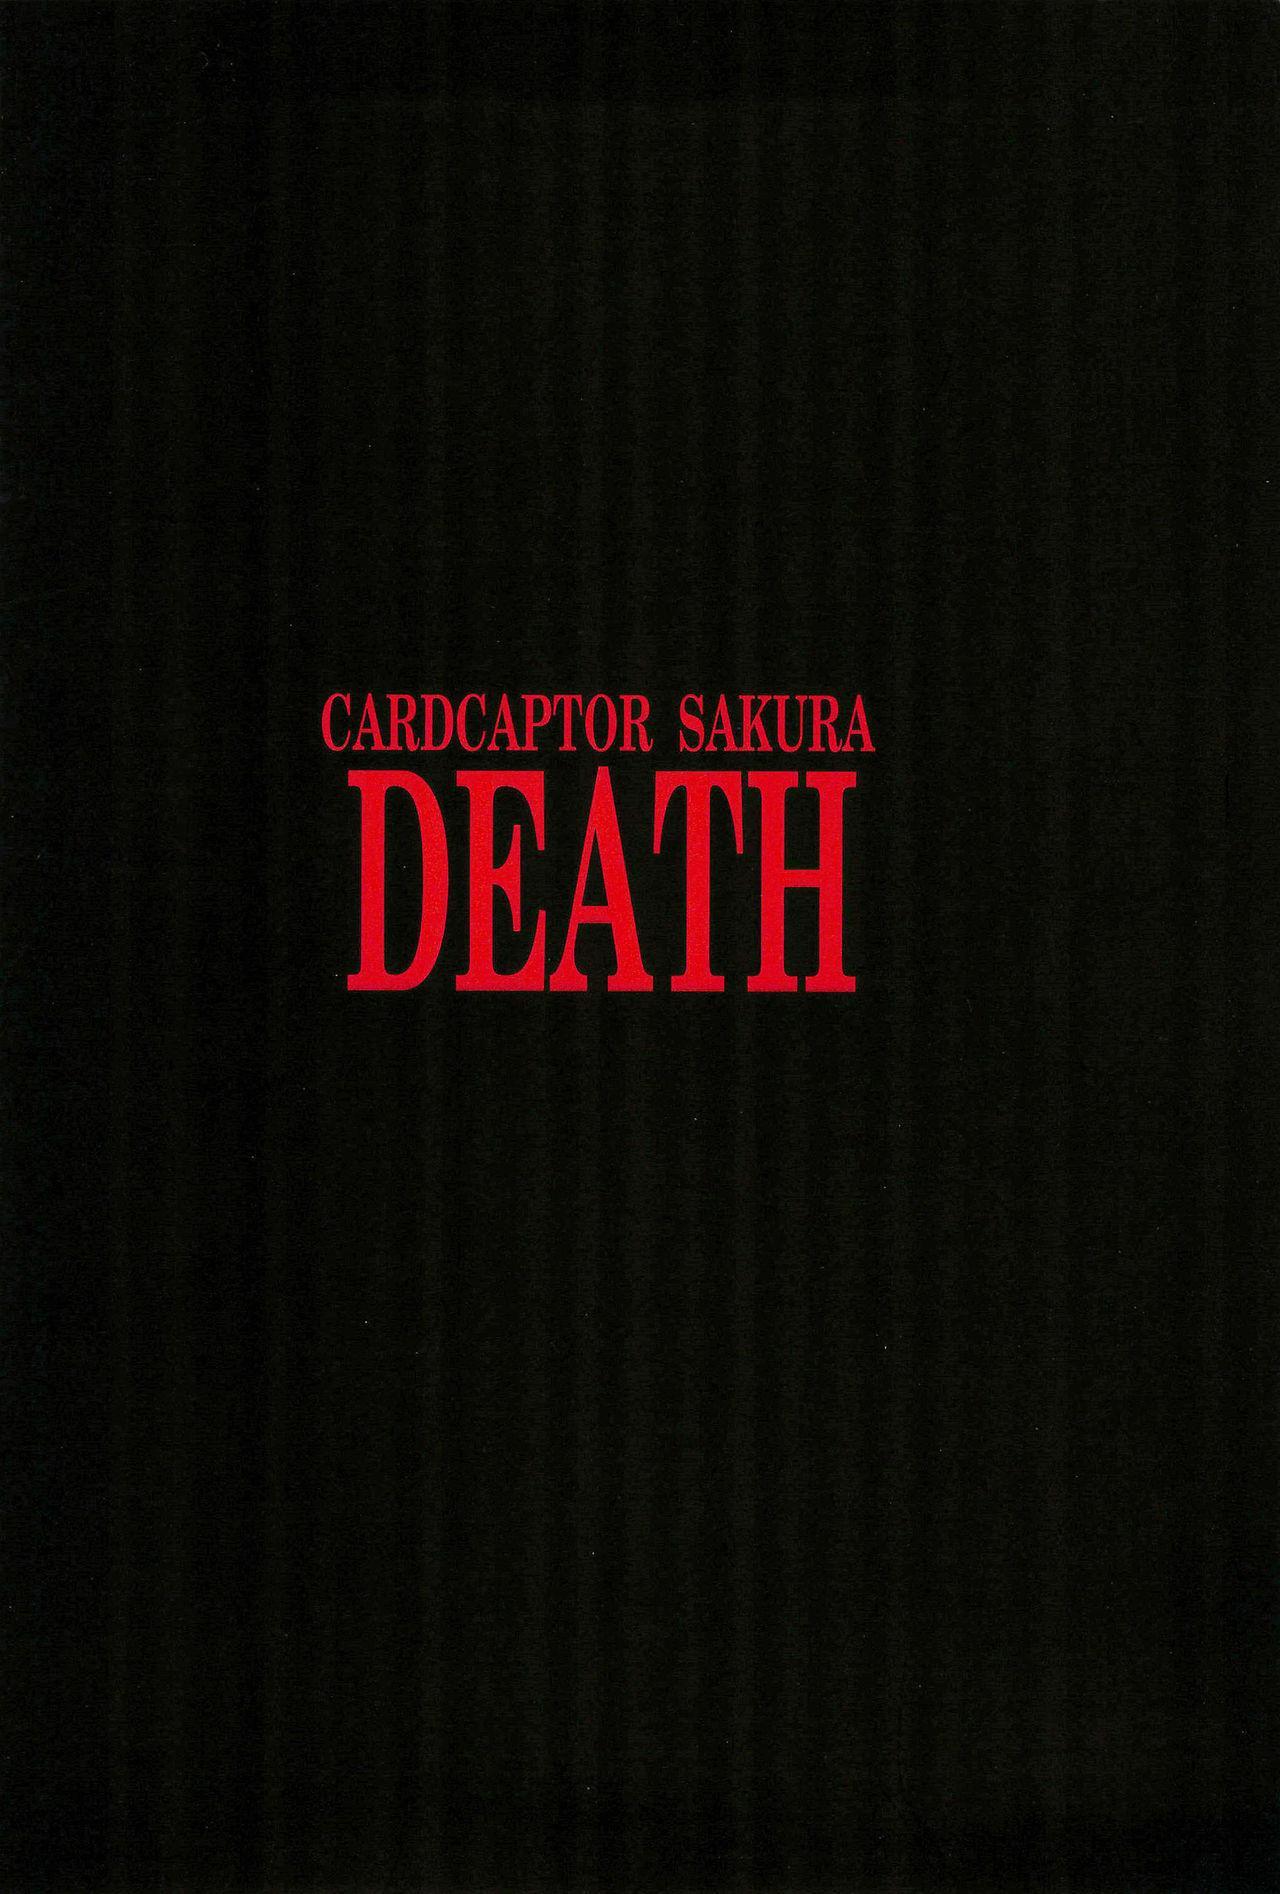 CARDCAPTOR SAKURA DEATH 51